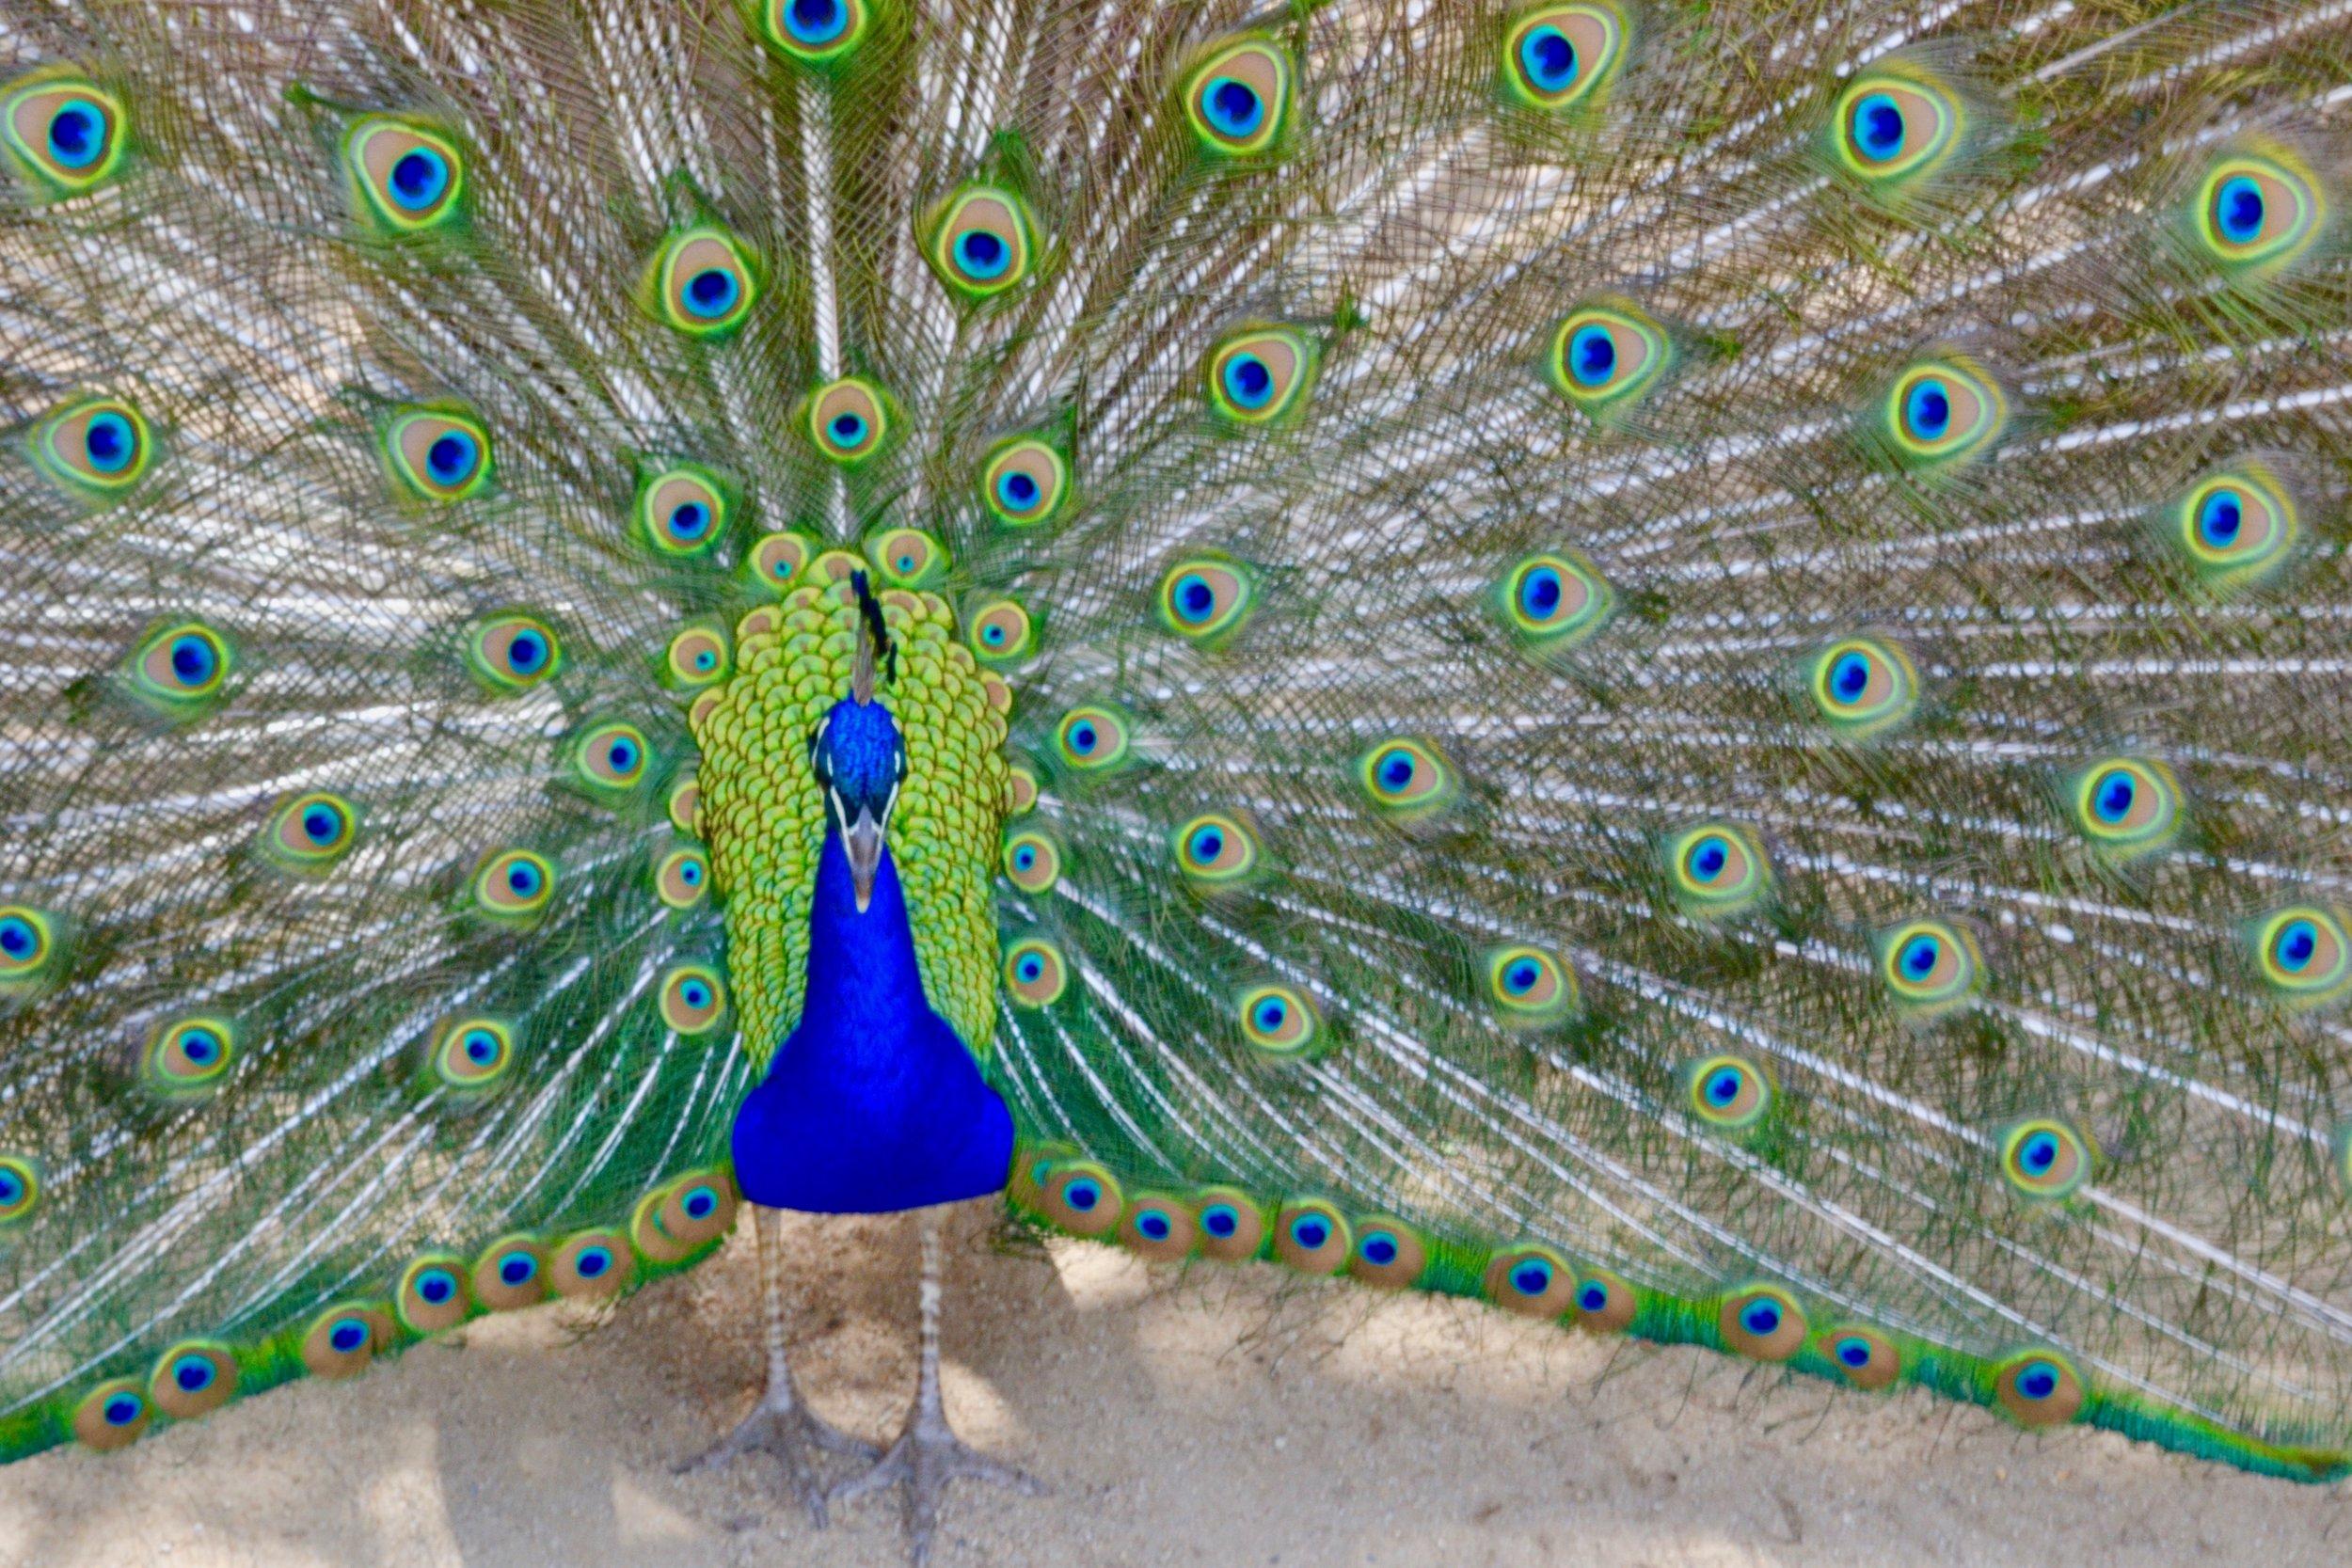 peacock close up.jpeg